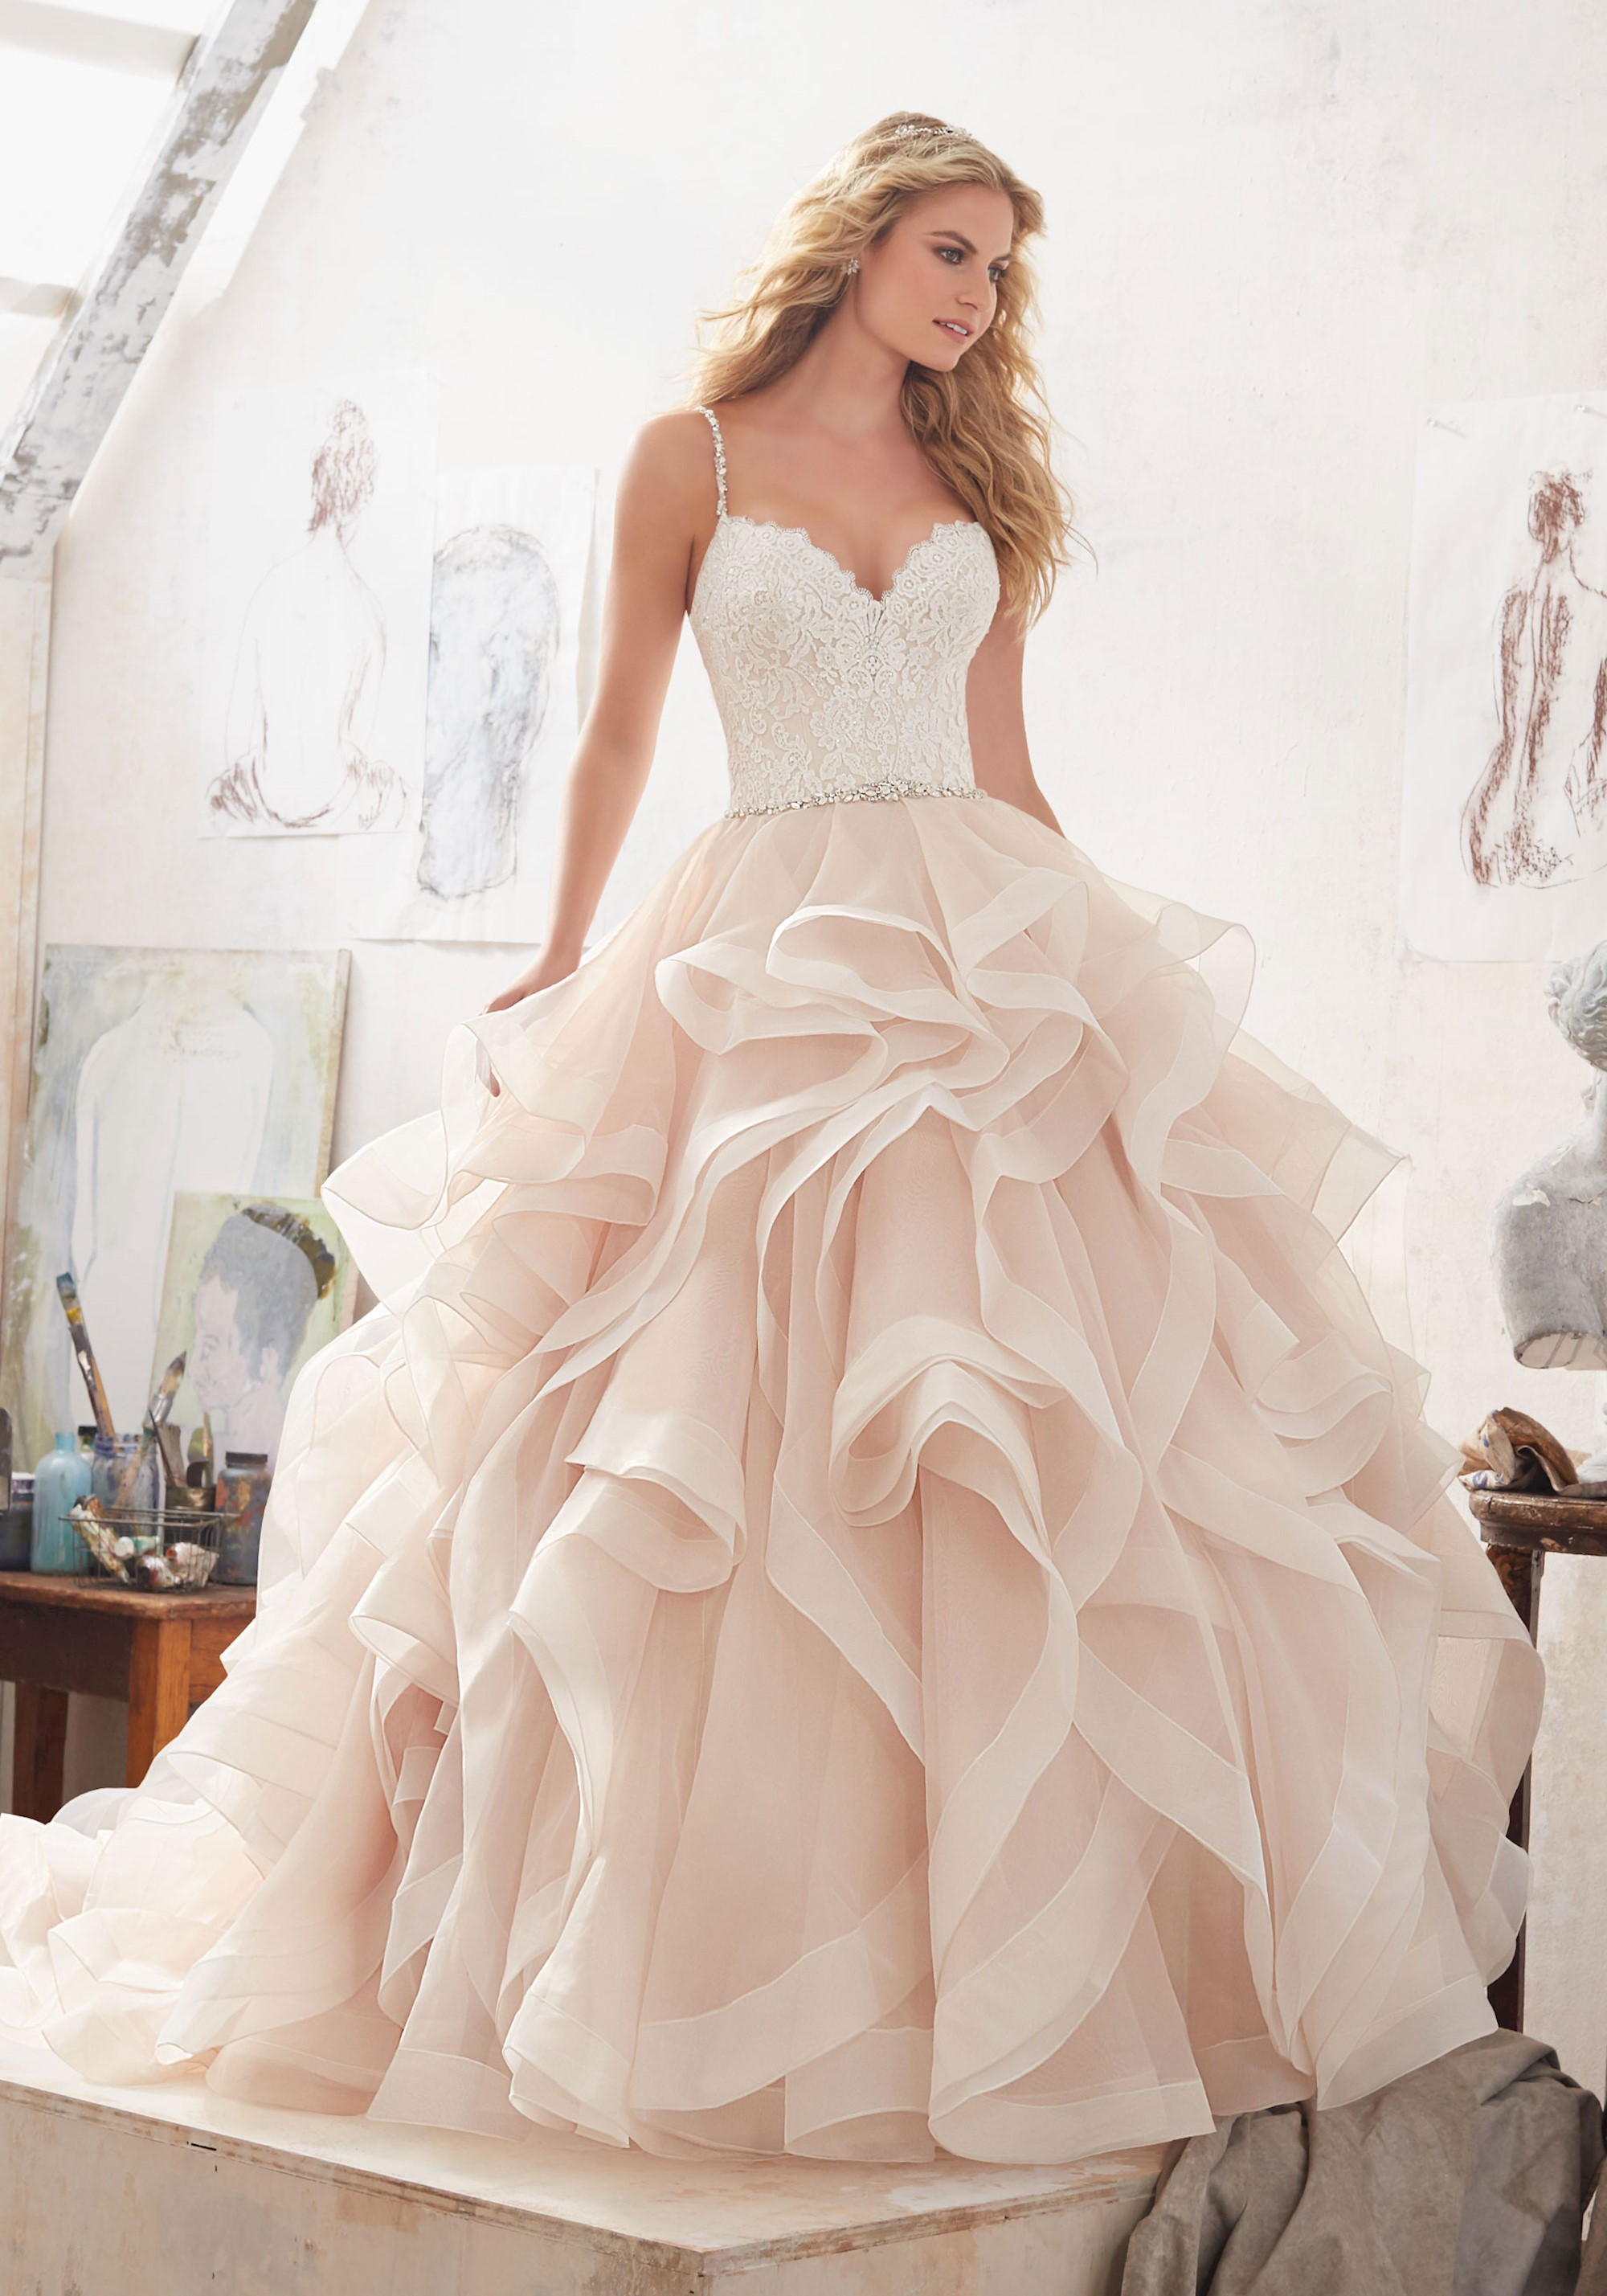 ff1e0f270e1 Romantic Beaded Bridal Ball Gown Lace Wedding Dresses